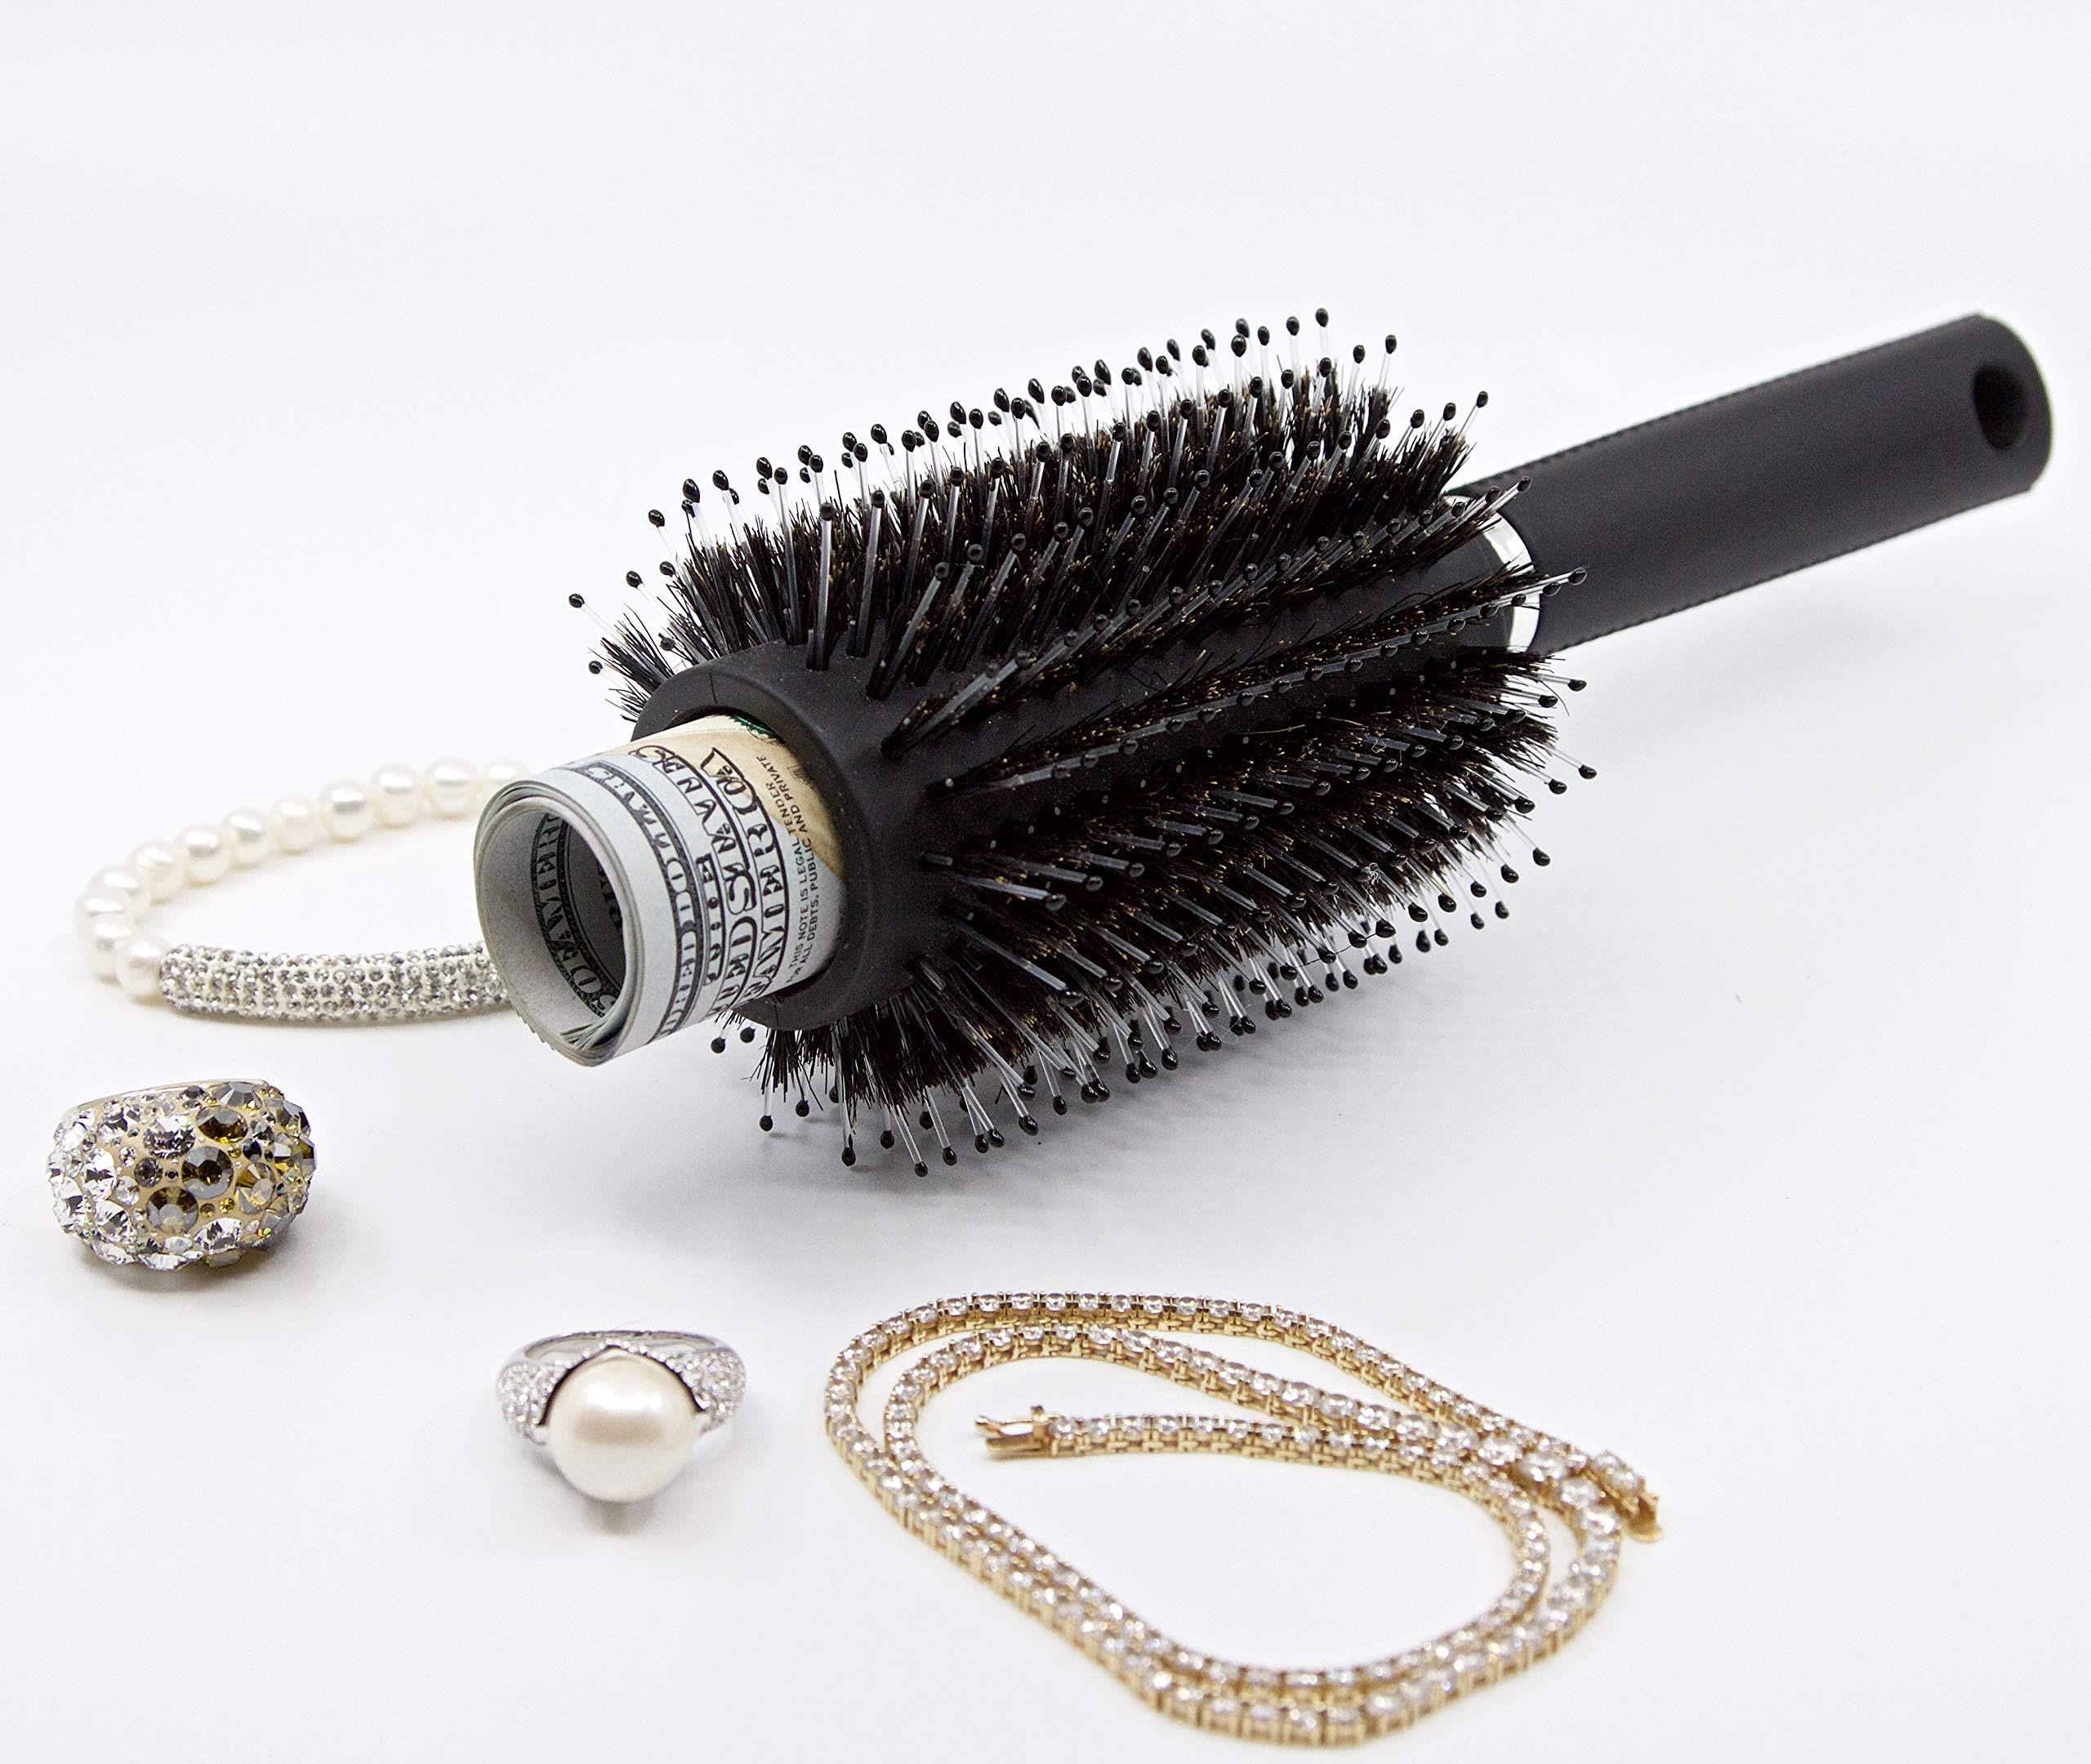 Mister Lit Hair Brush Stash & Diversion Safe-Functional Brush w/Secret Top (2 Pack)